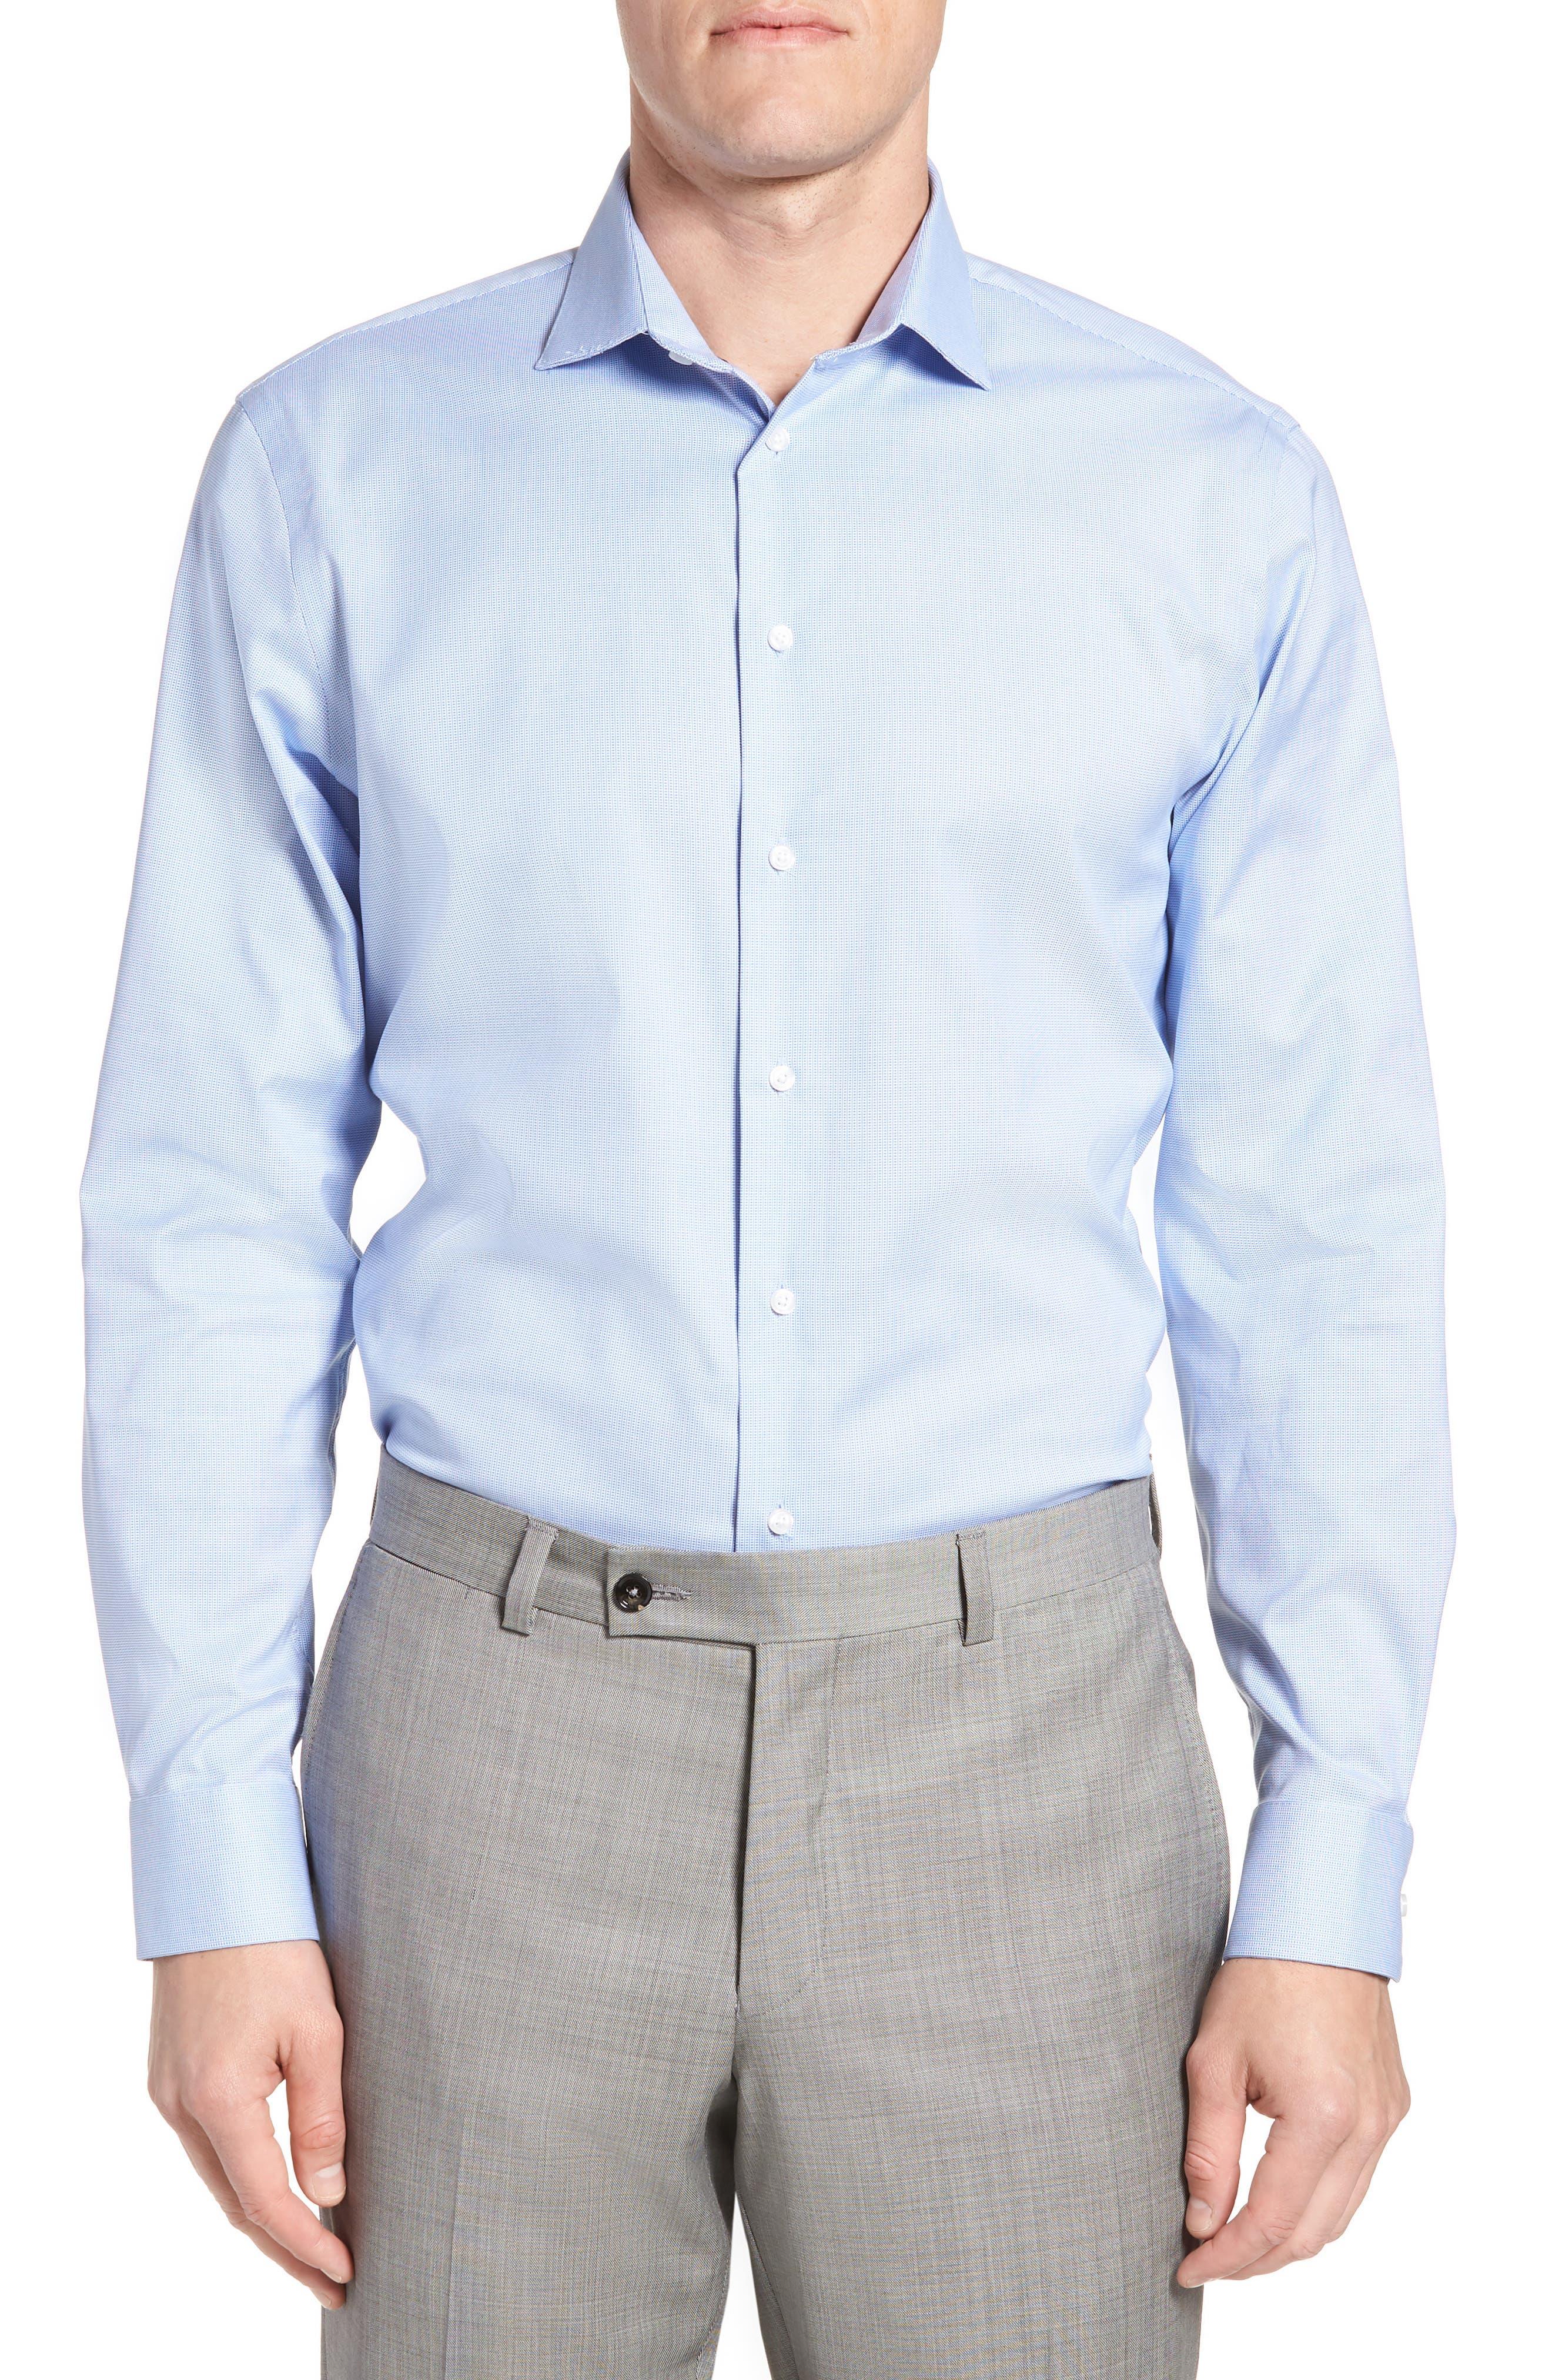 Calibrate Trim Fit Non-Iron Stretch Dress Shirt